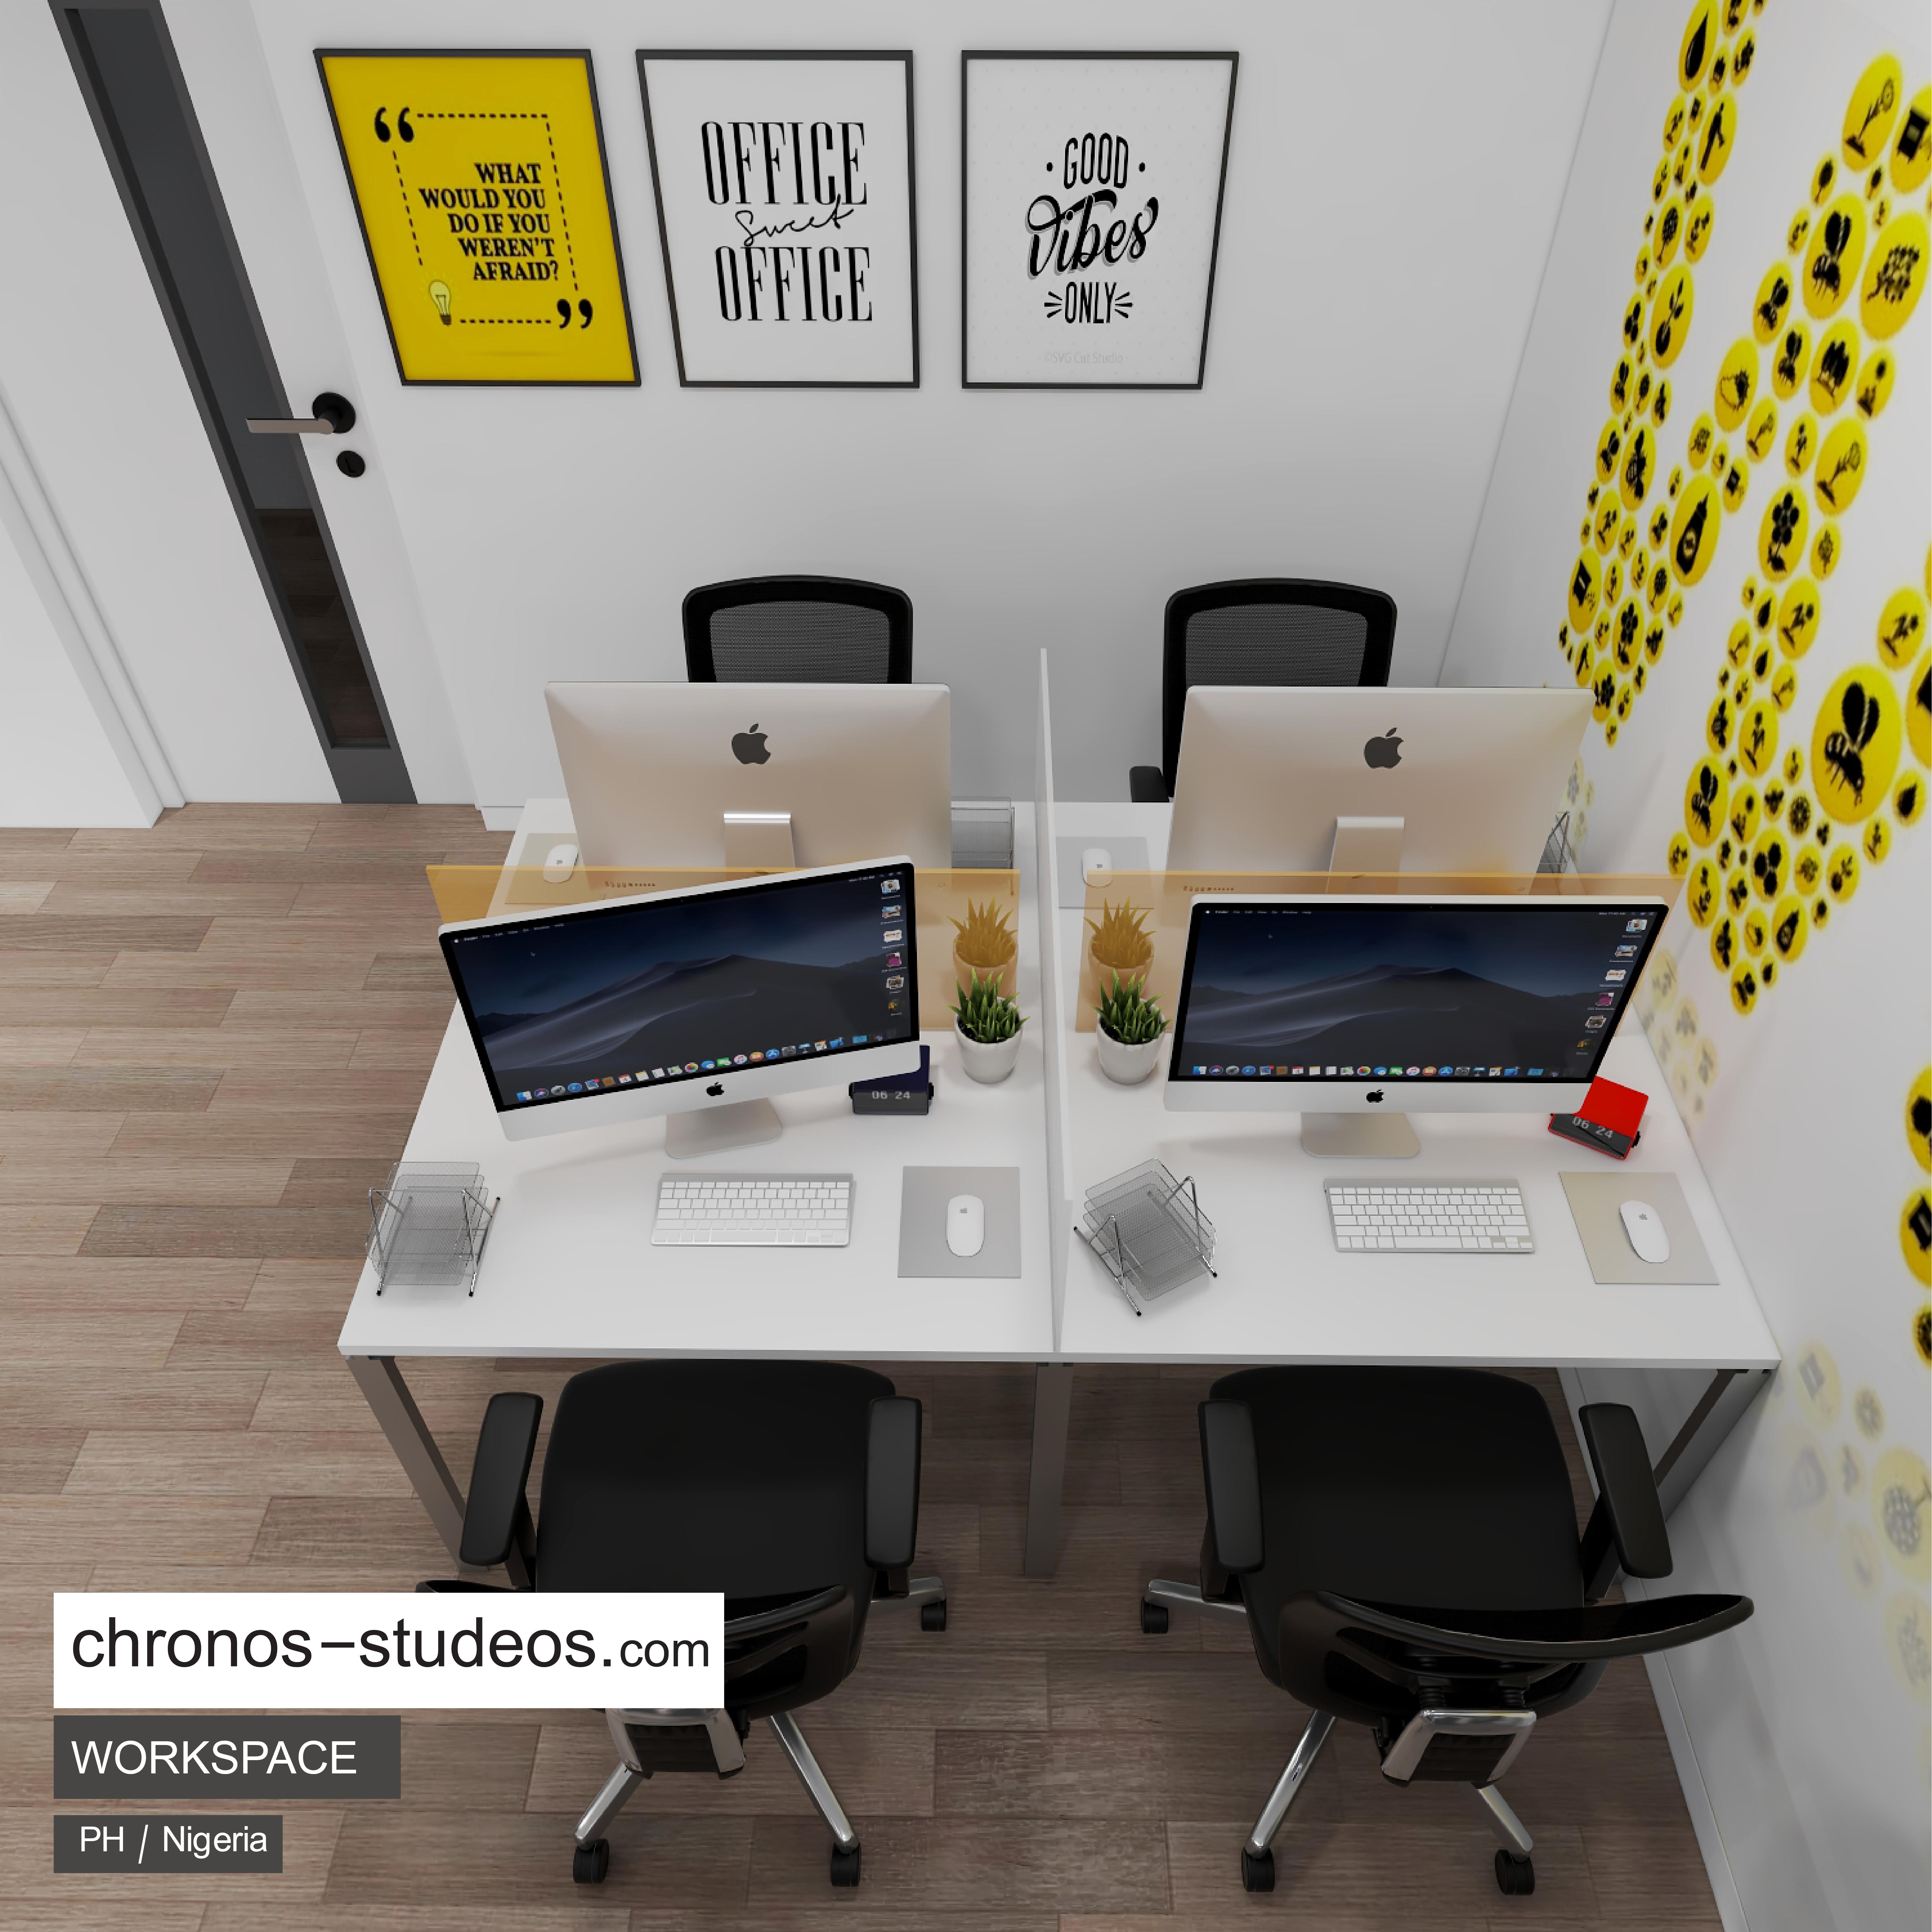 office-interior-design-chronos-studeos-architects